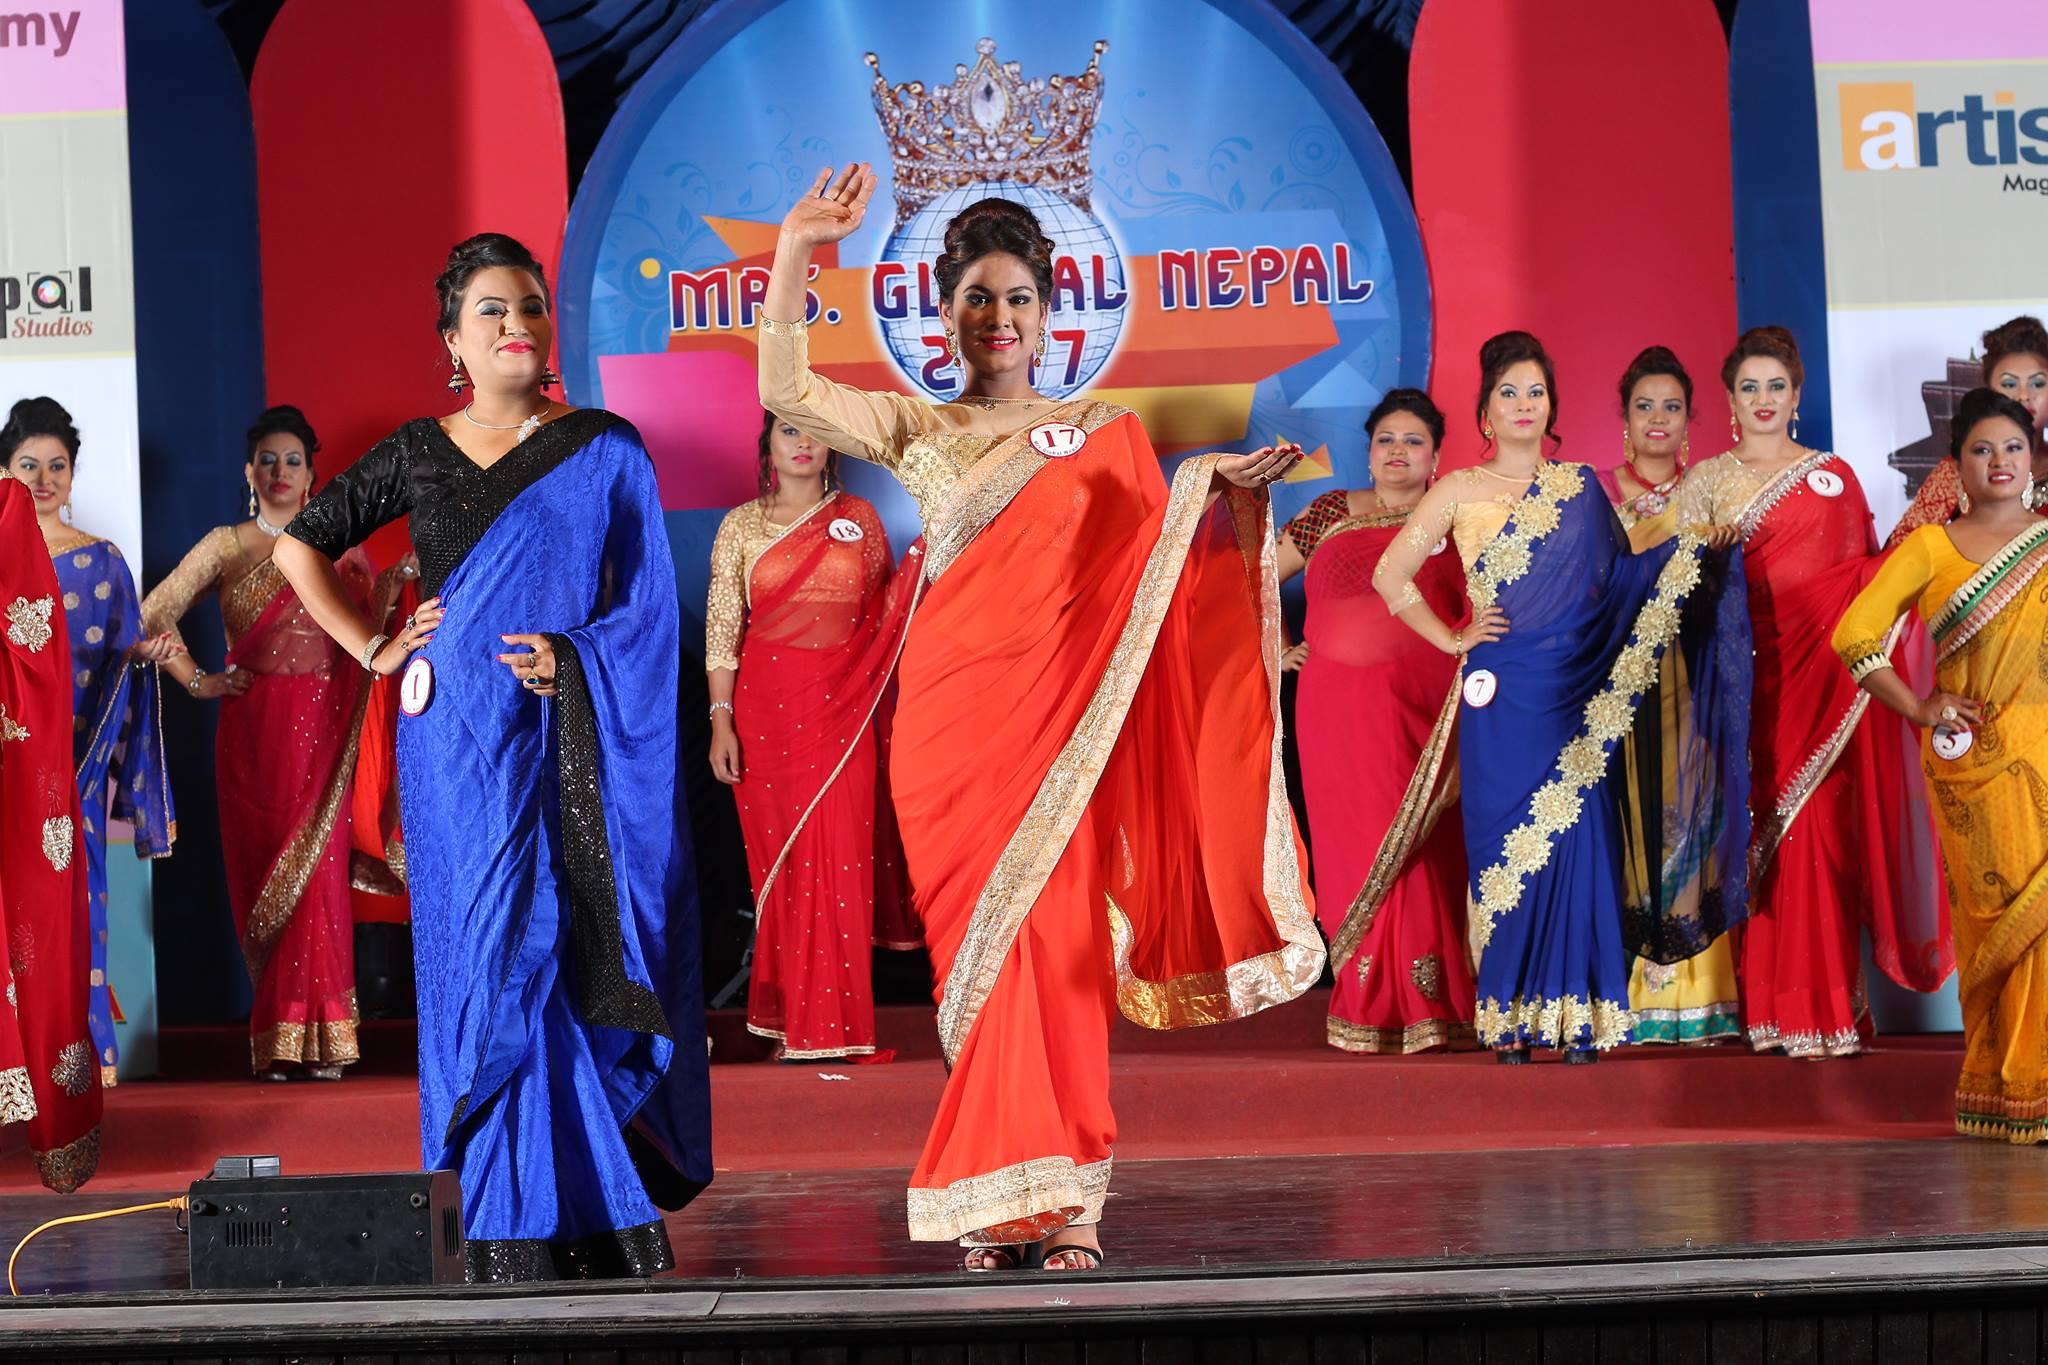 mrs global nepal 2017 final 5